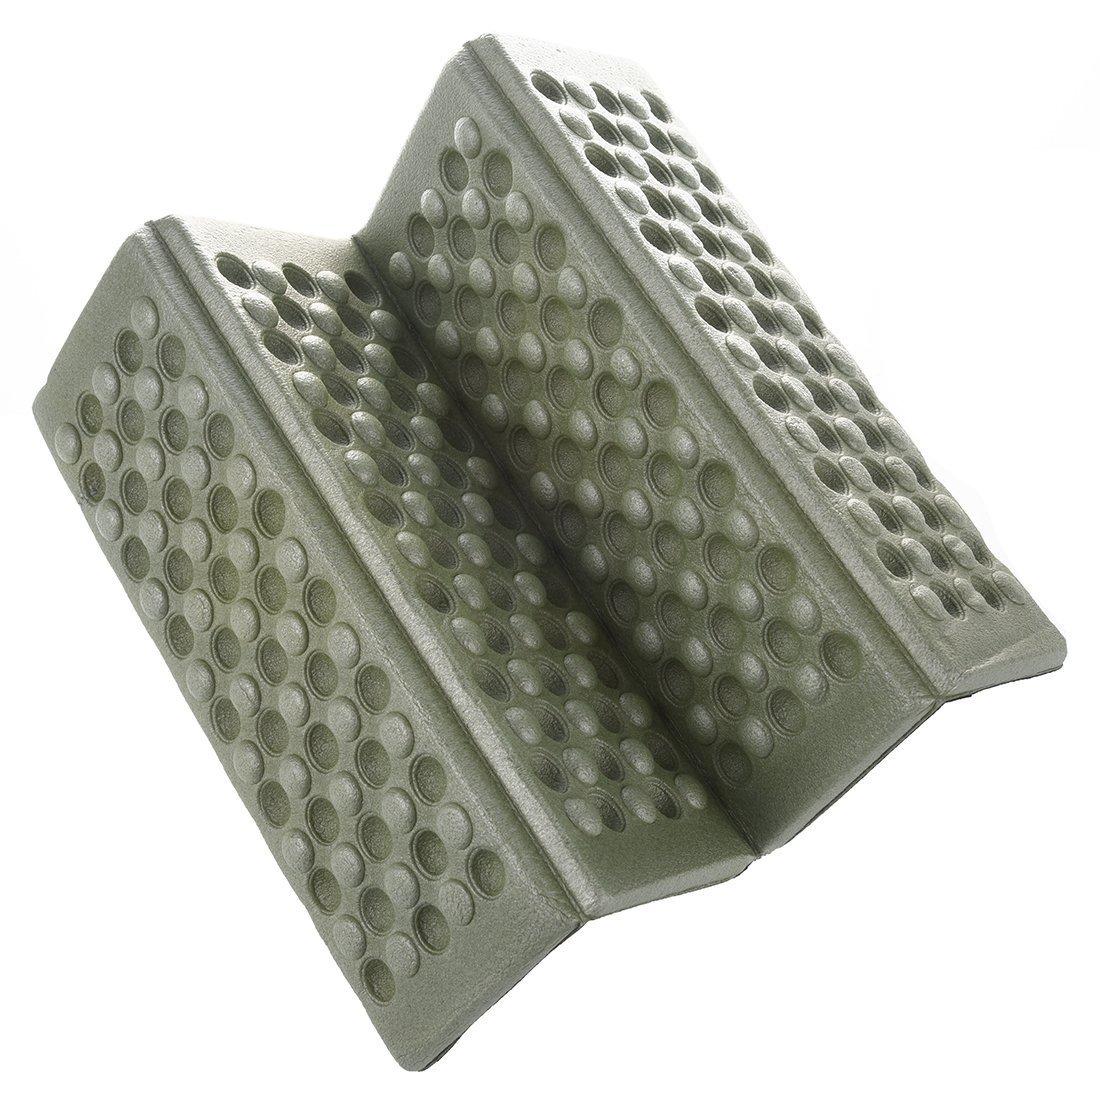 Foam Seat Pad - TOOGOO(R) Personalized Folding Foam Waterproof Seat Pad Chair Cushion Orange SODIAL (R) SHOMAGT7976